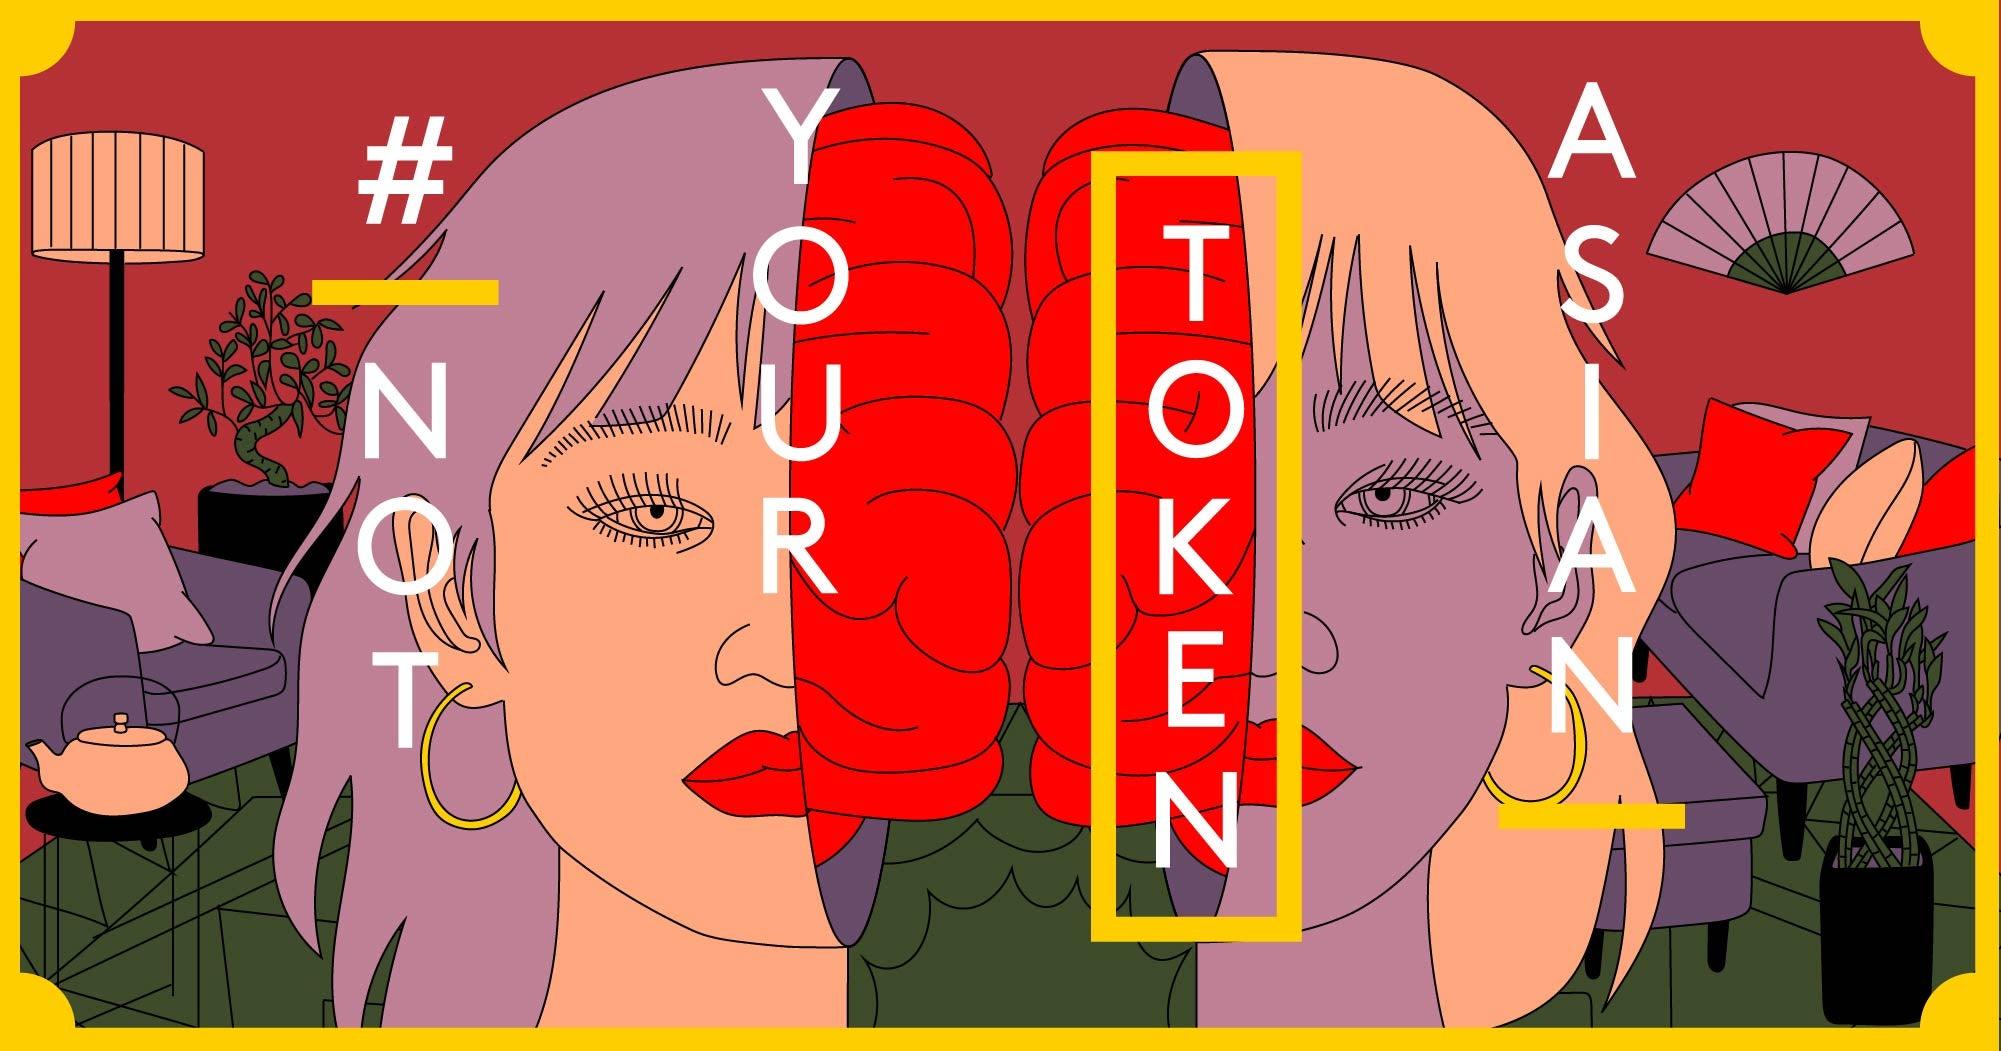 www.refinery29.com: The Asian-American Stigma Around Mental Health Therapy